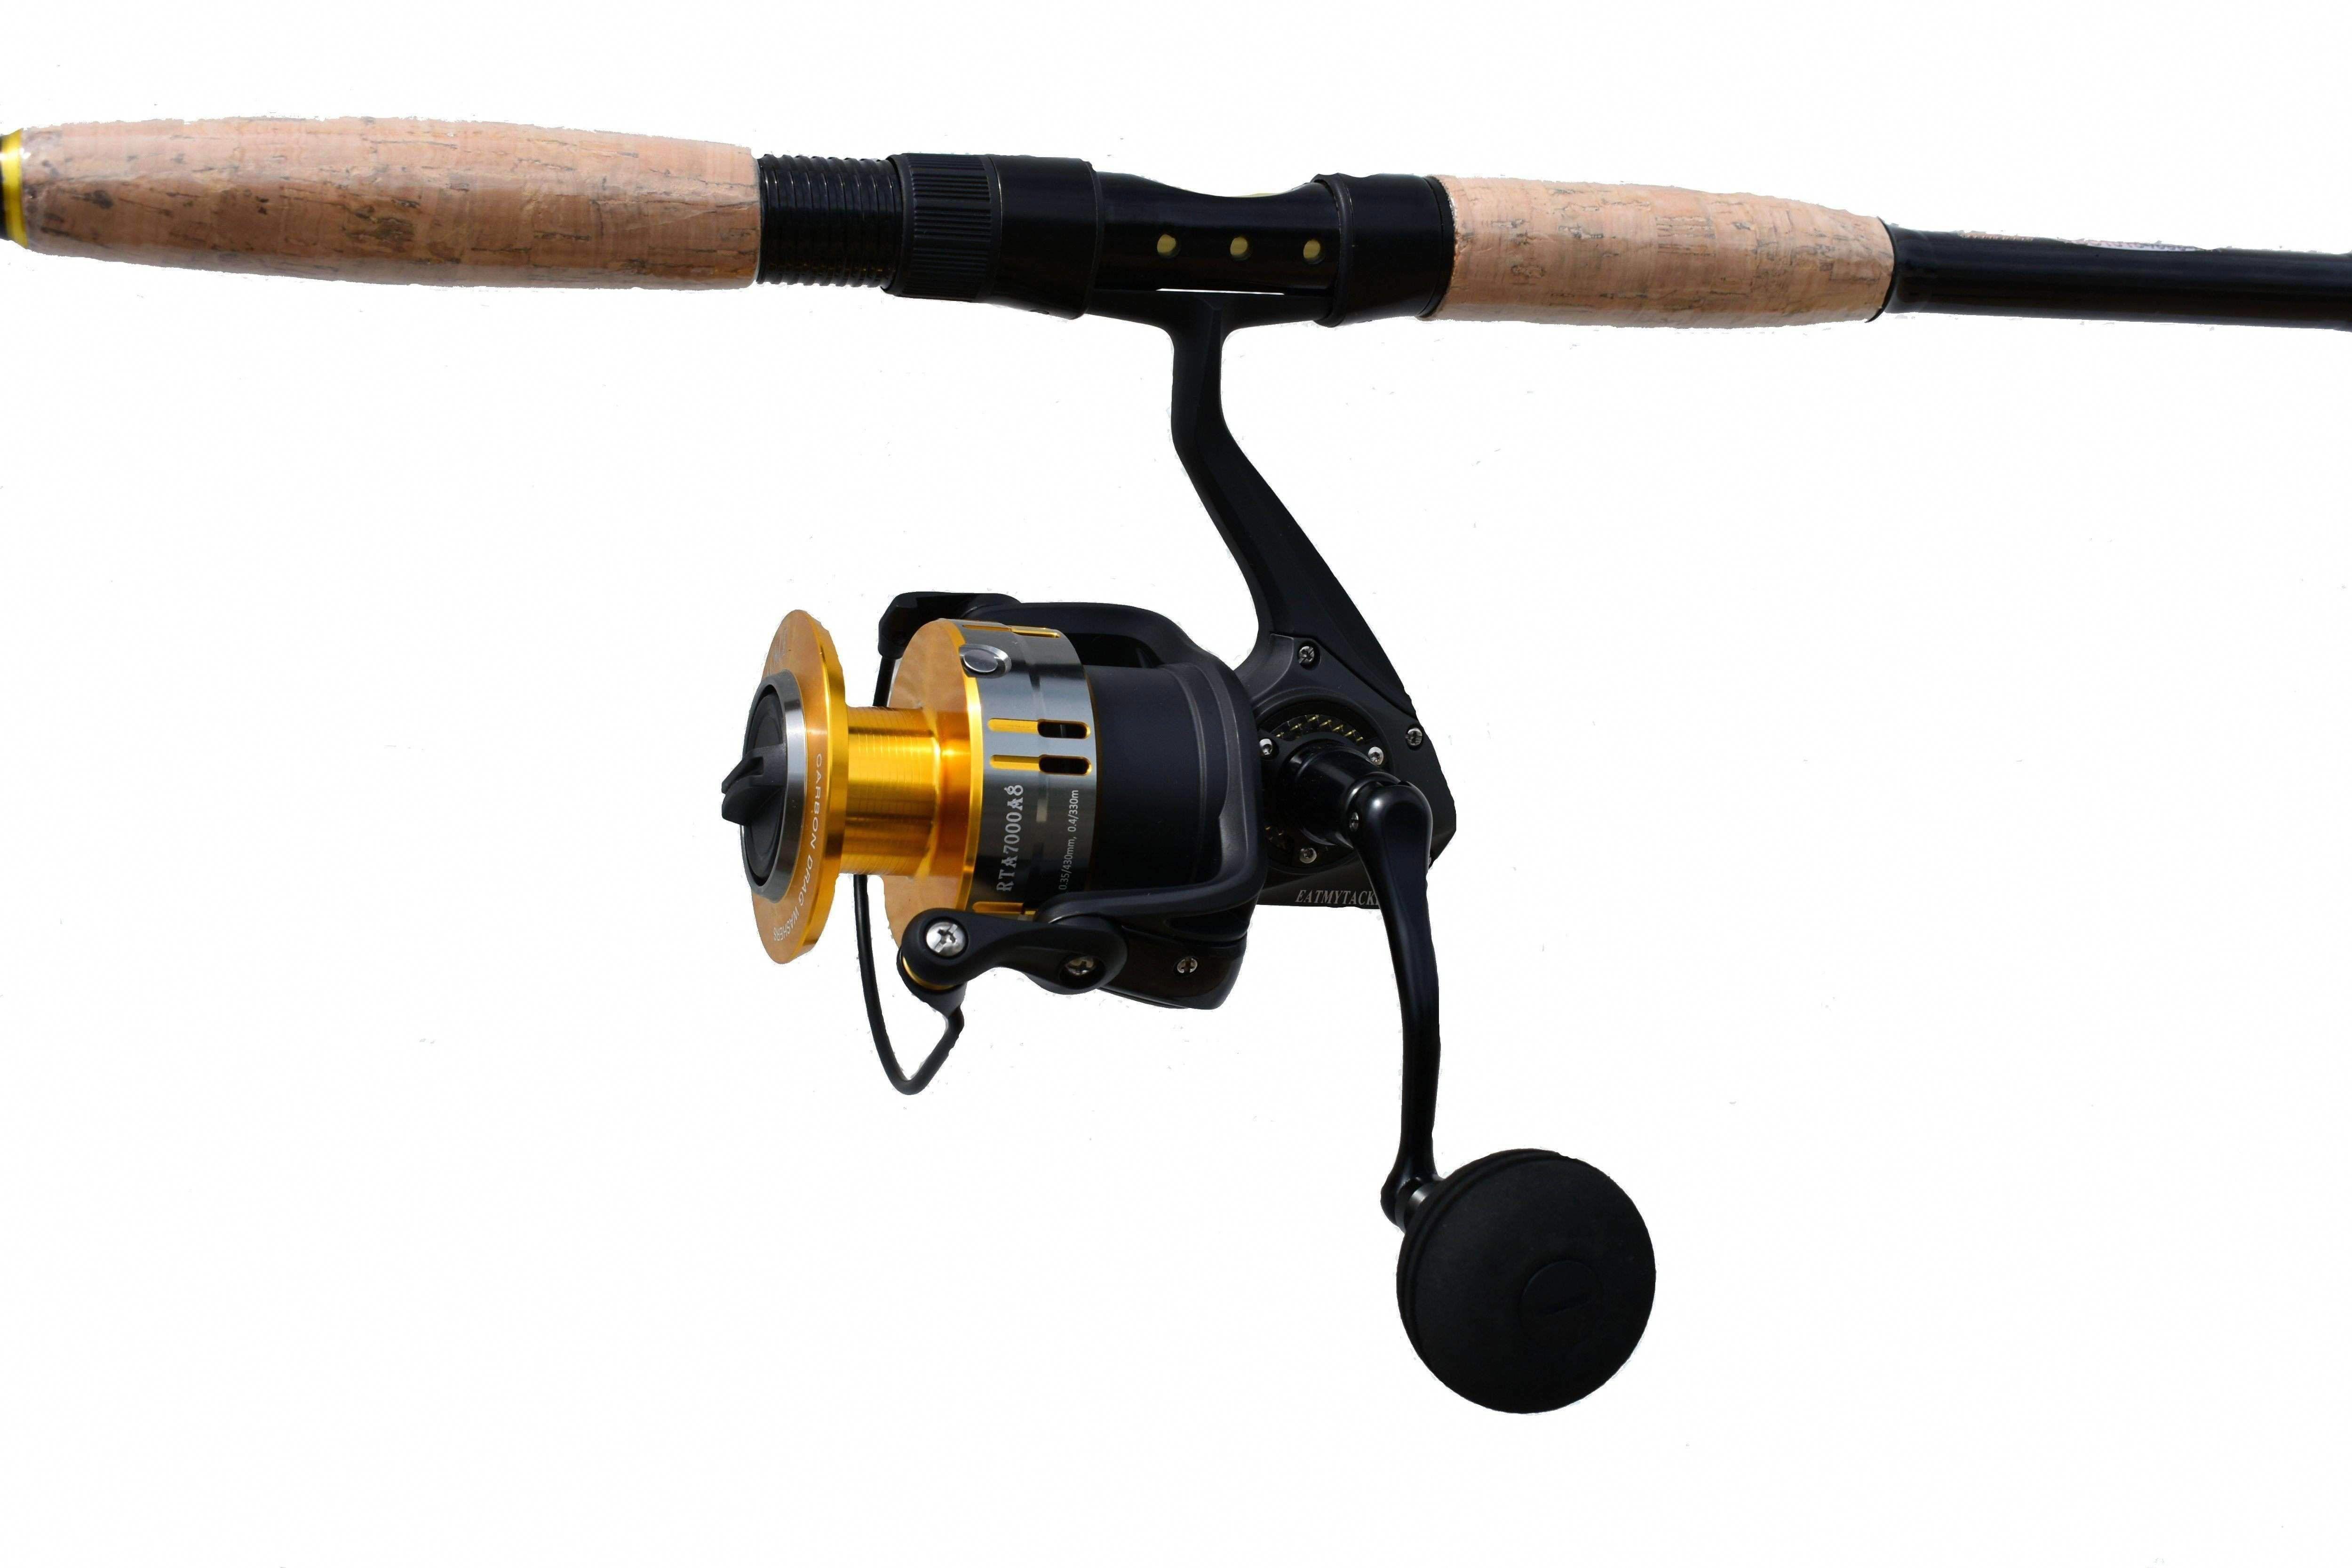 7 Combo Bluefish Predator Spinning Fishing Rod And Reel Saltwater Fishing Angler Fishinglife Saltwaterlu Fishing Rods And Reels Rod And Reel Fishing Rod